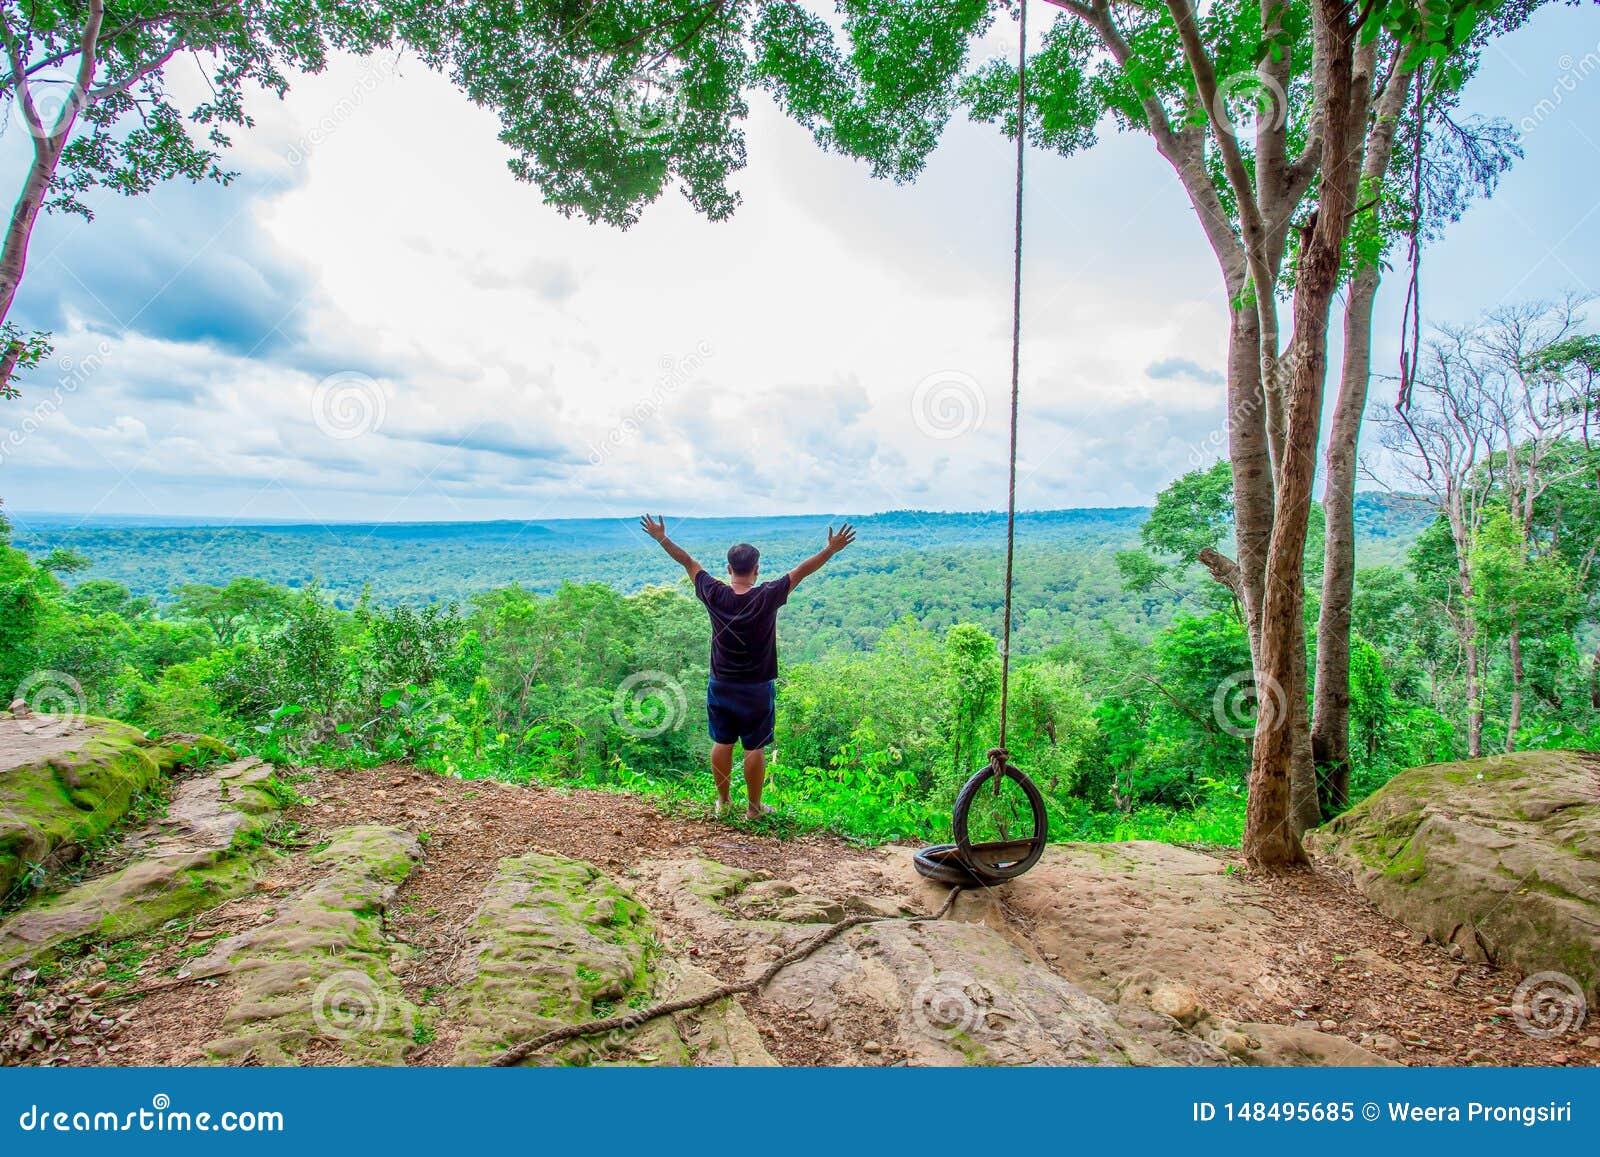 Berg die, het Beklimmen, Zonsopgang - Dawn, Wandeling, Bergbeklimming beklimmen